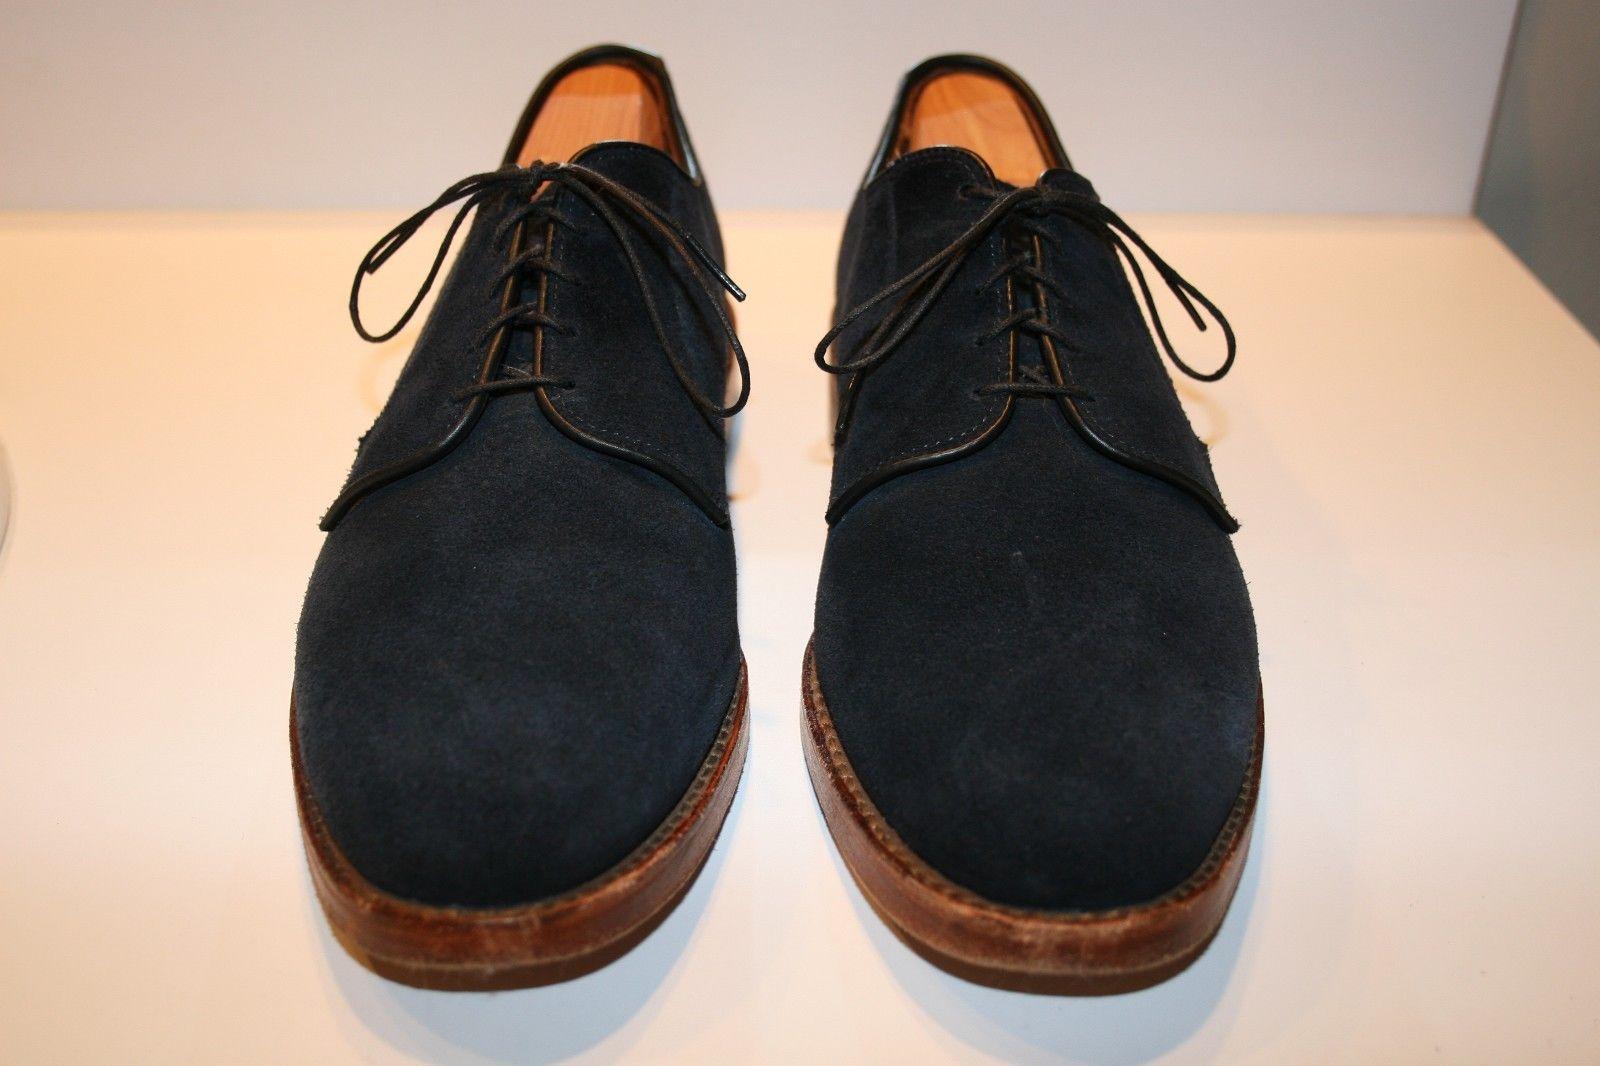 Navy shoes styleforum